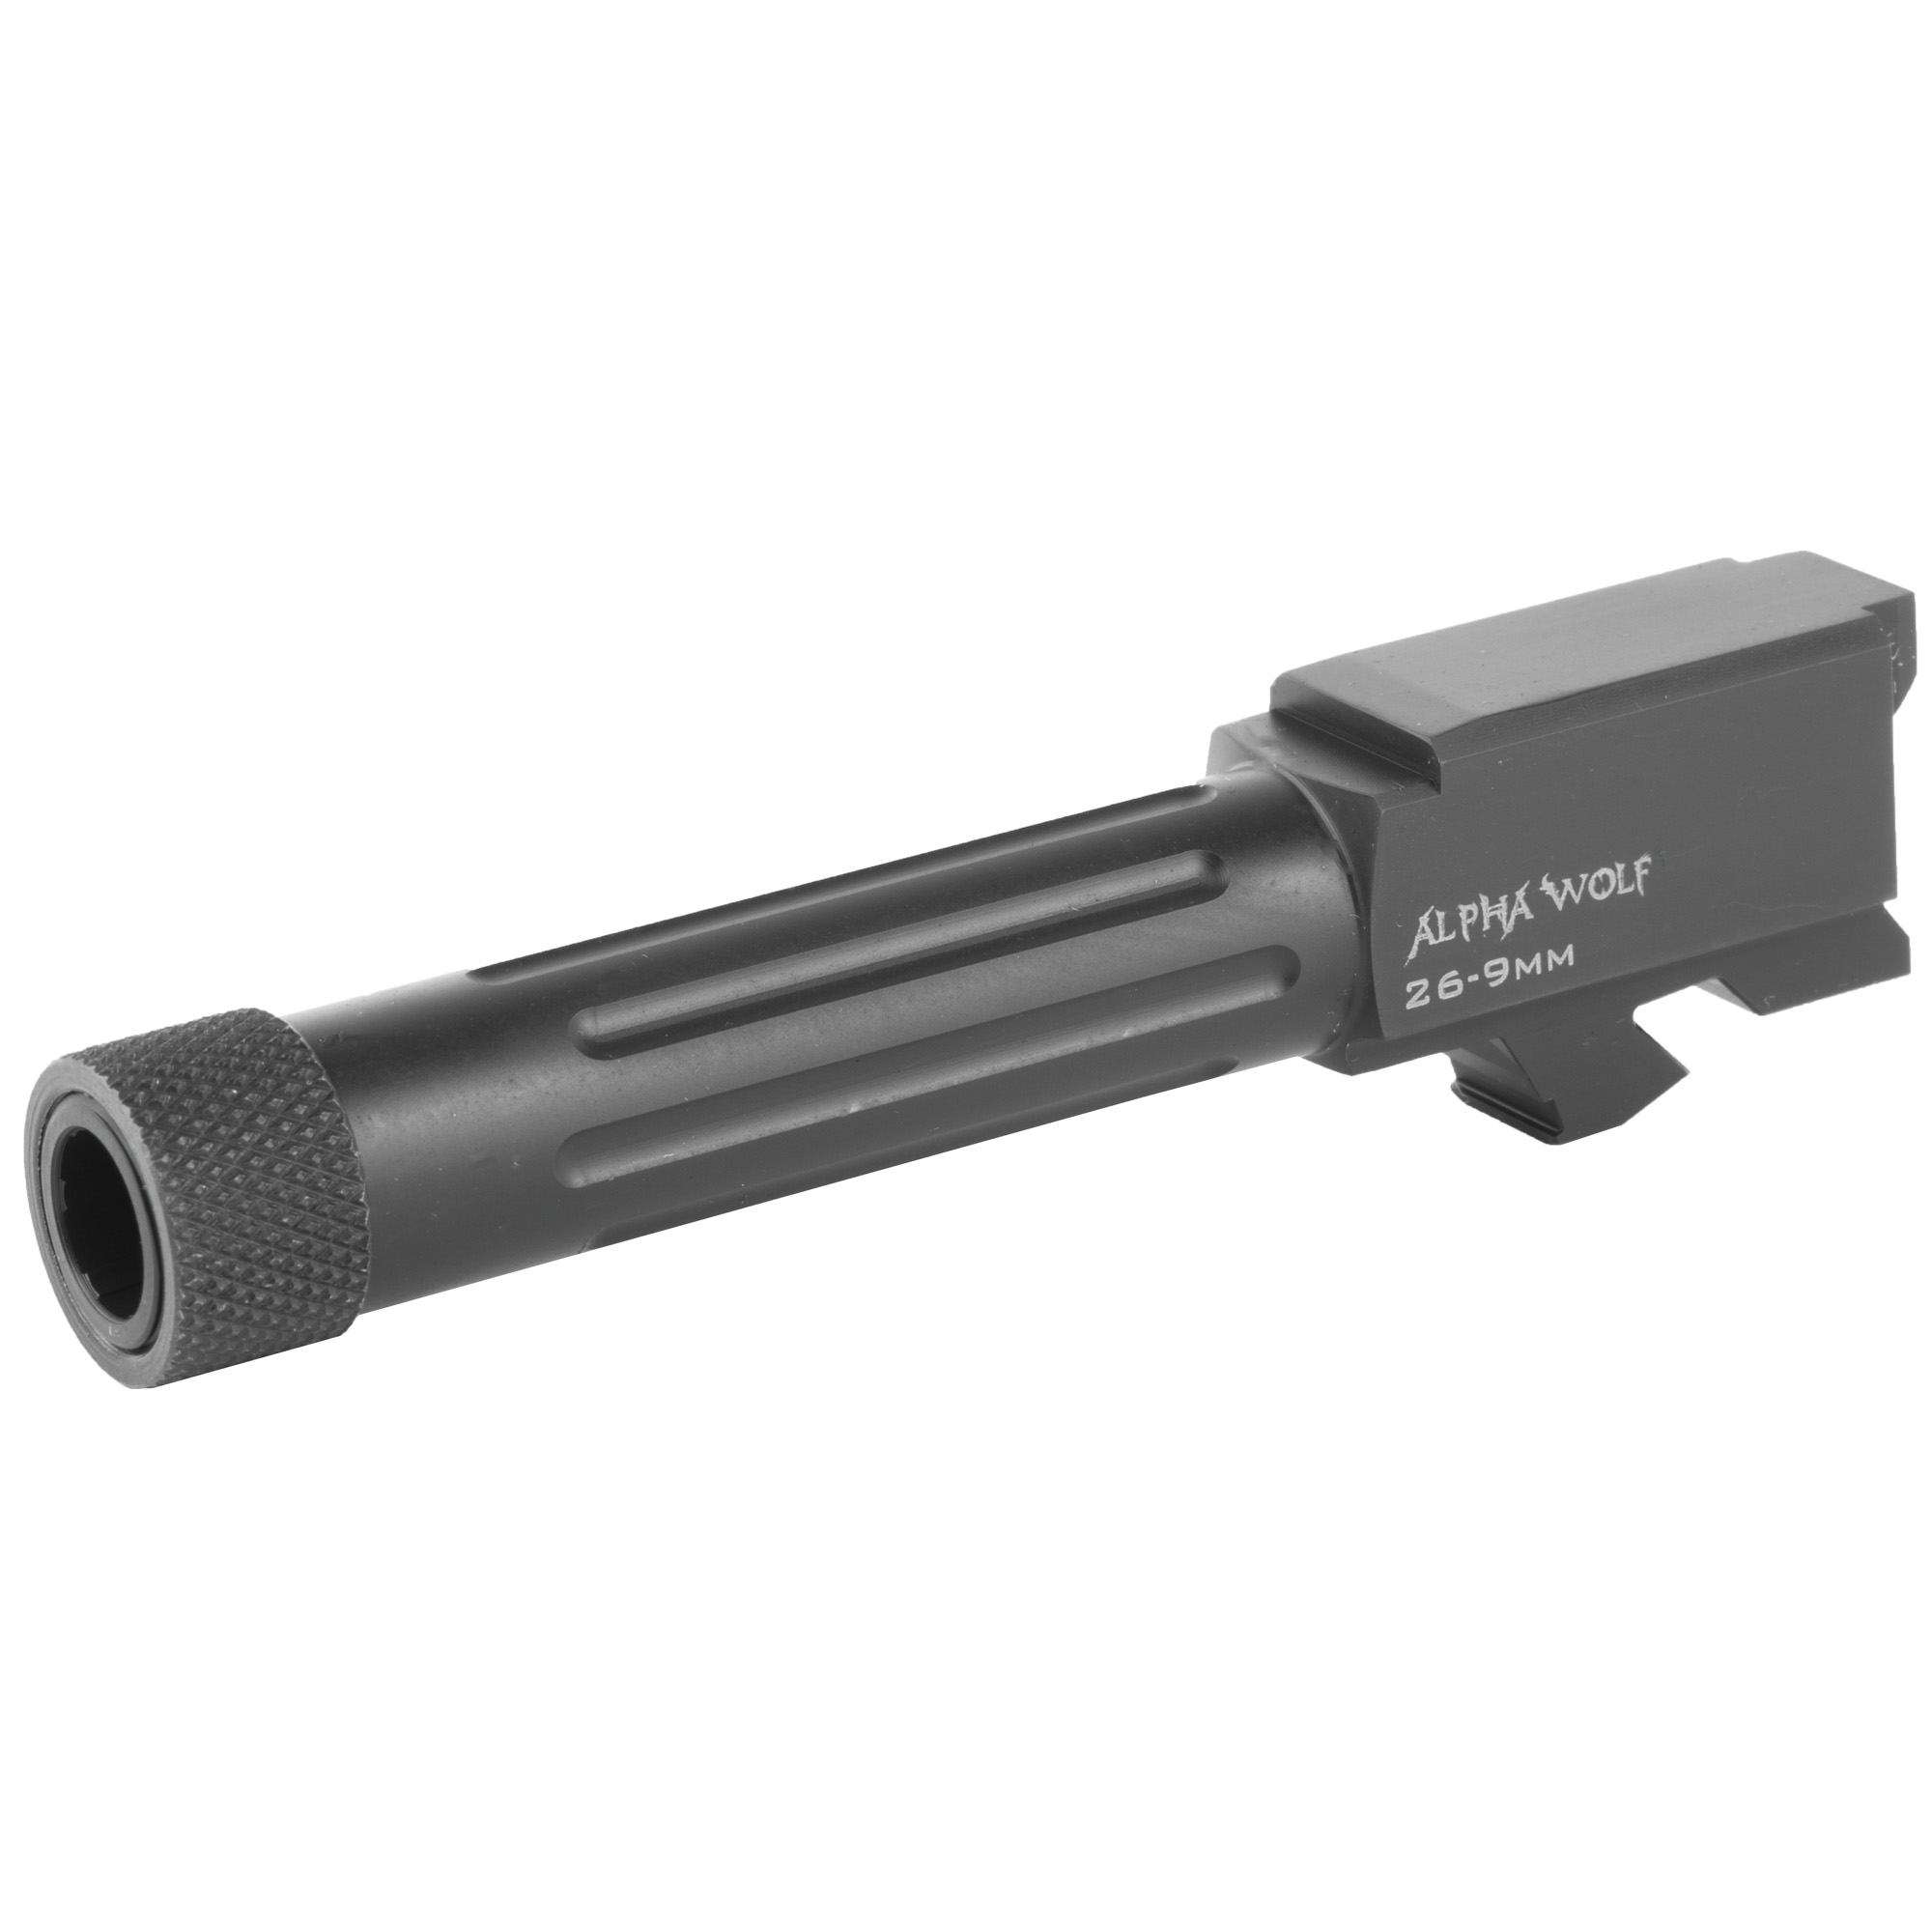 Lwd Alphawolf Bbl For G26 9mm Thrdd